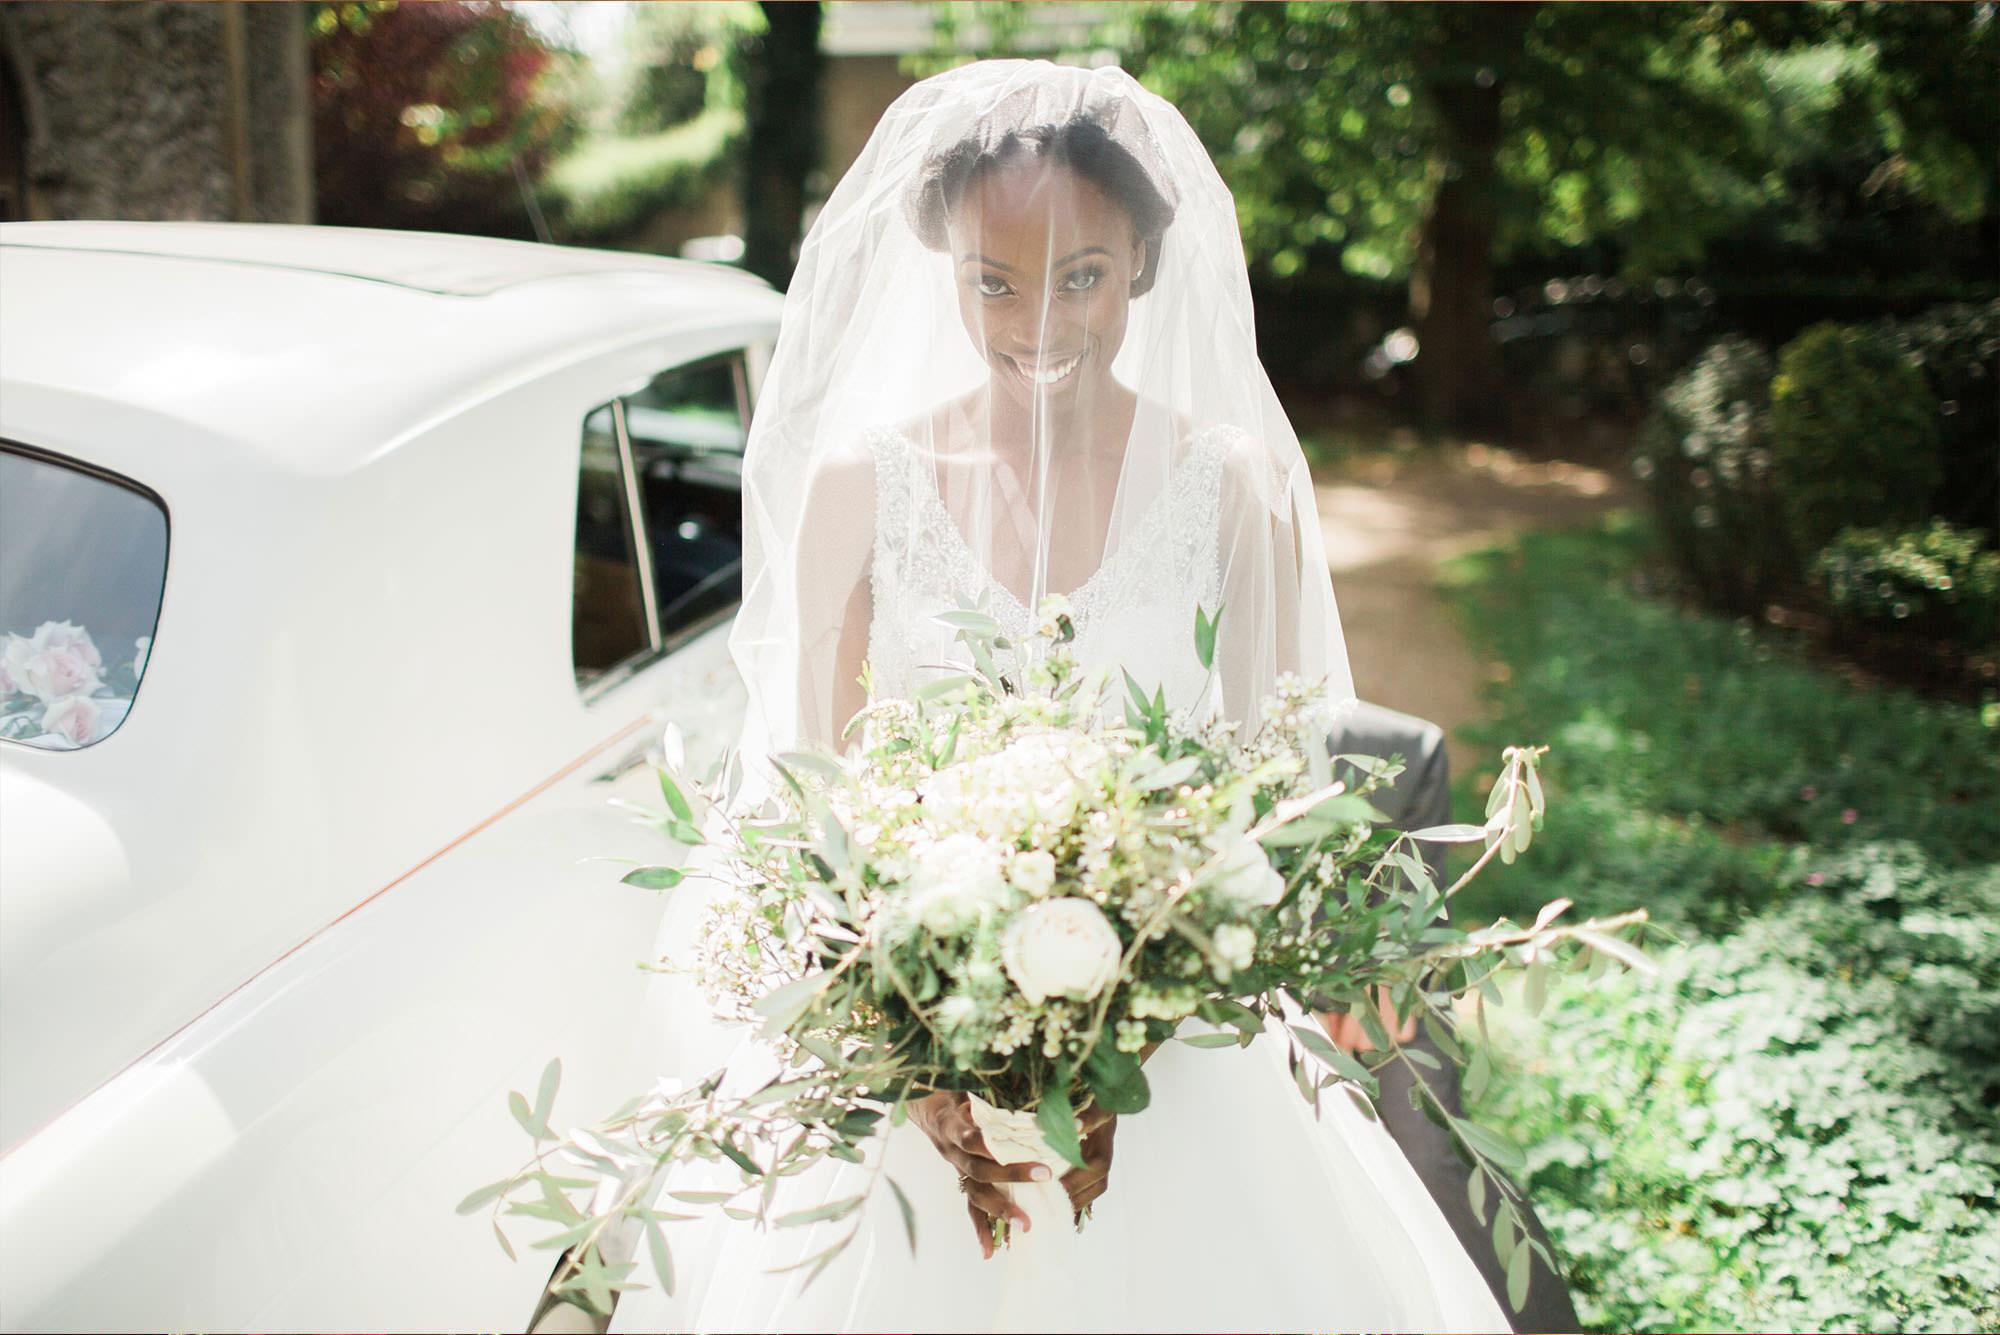 Afmena Events - Luxury Wedding Florist + Styling - London,